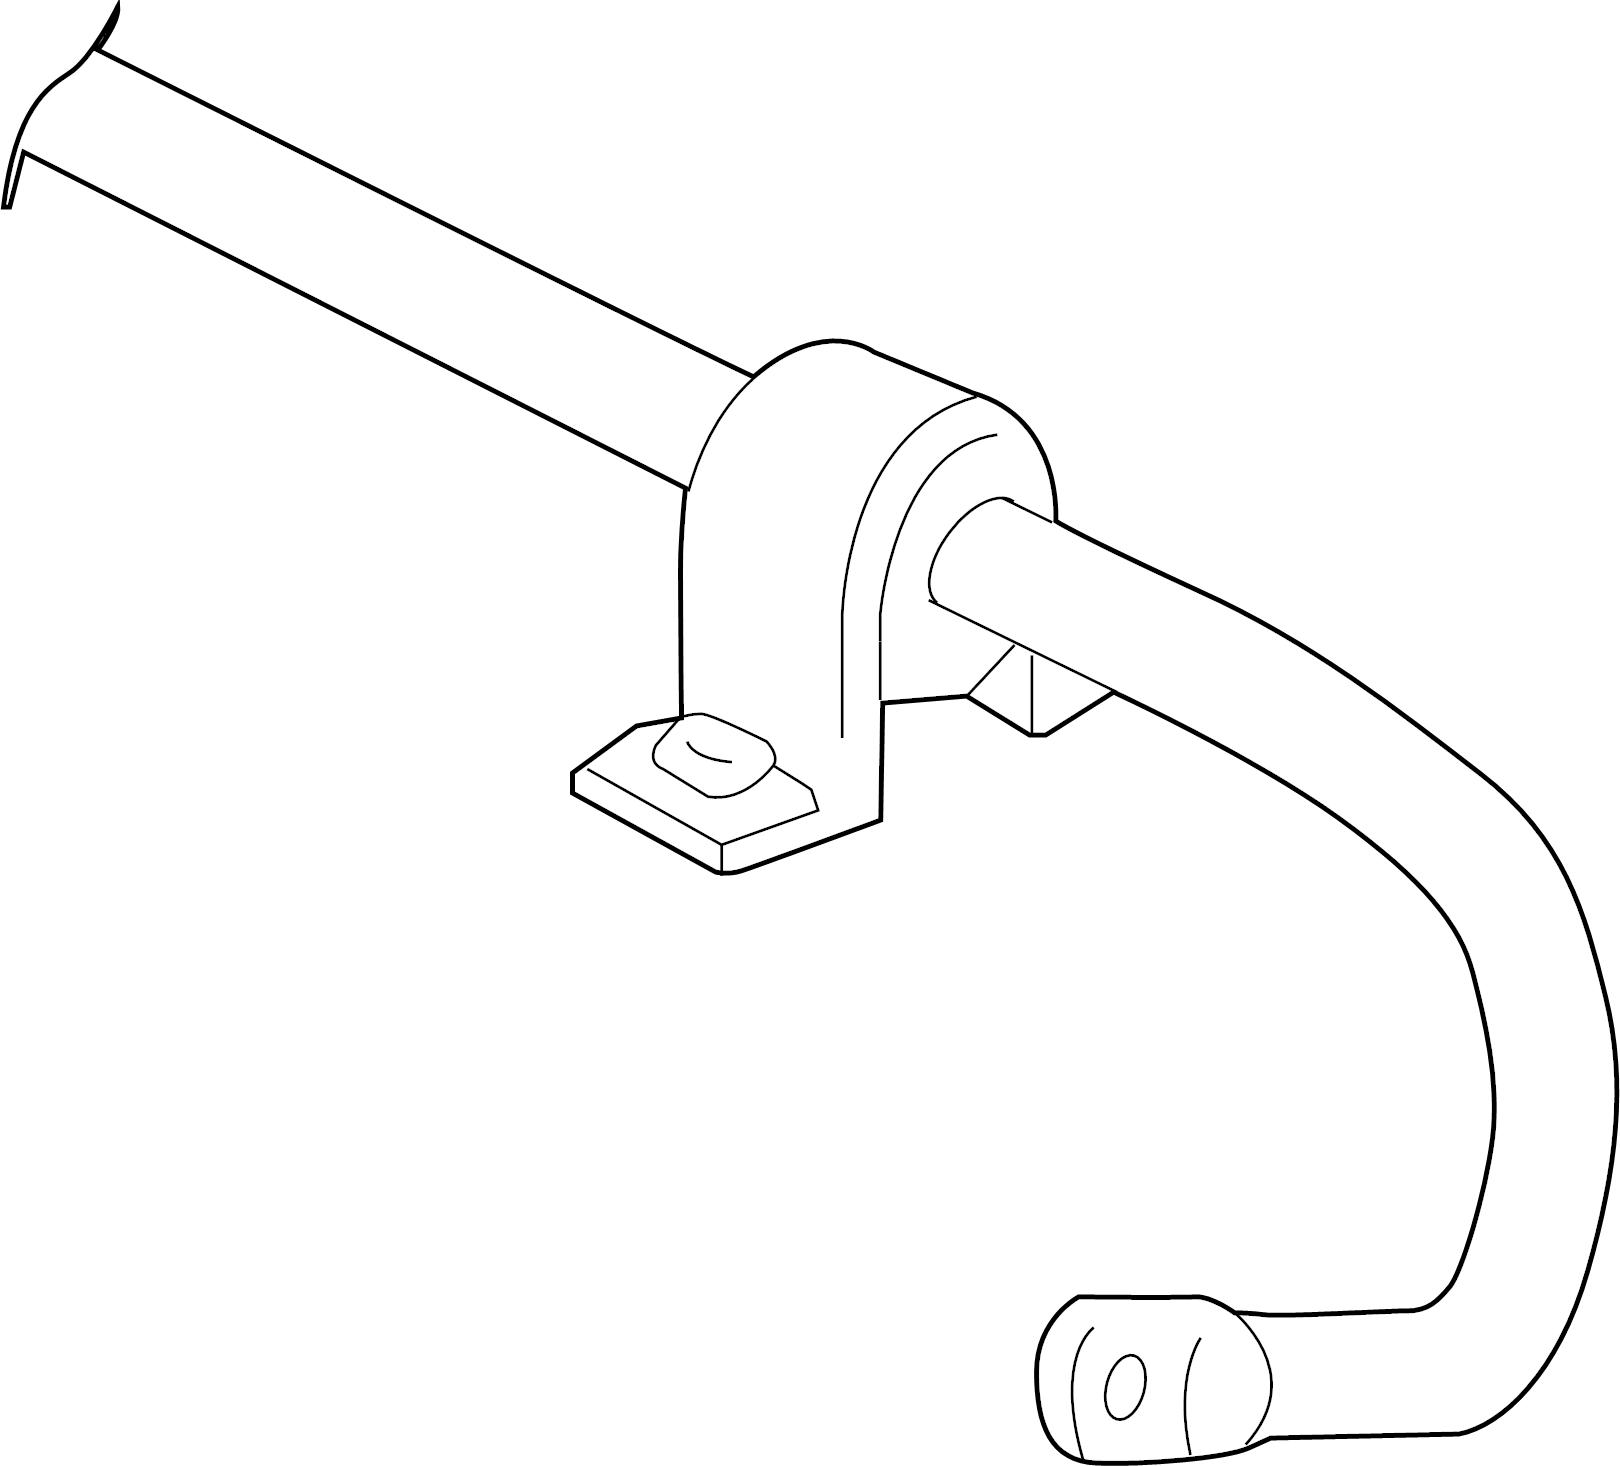 Volkswagen Beetle Suspension Stabilizer Bar